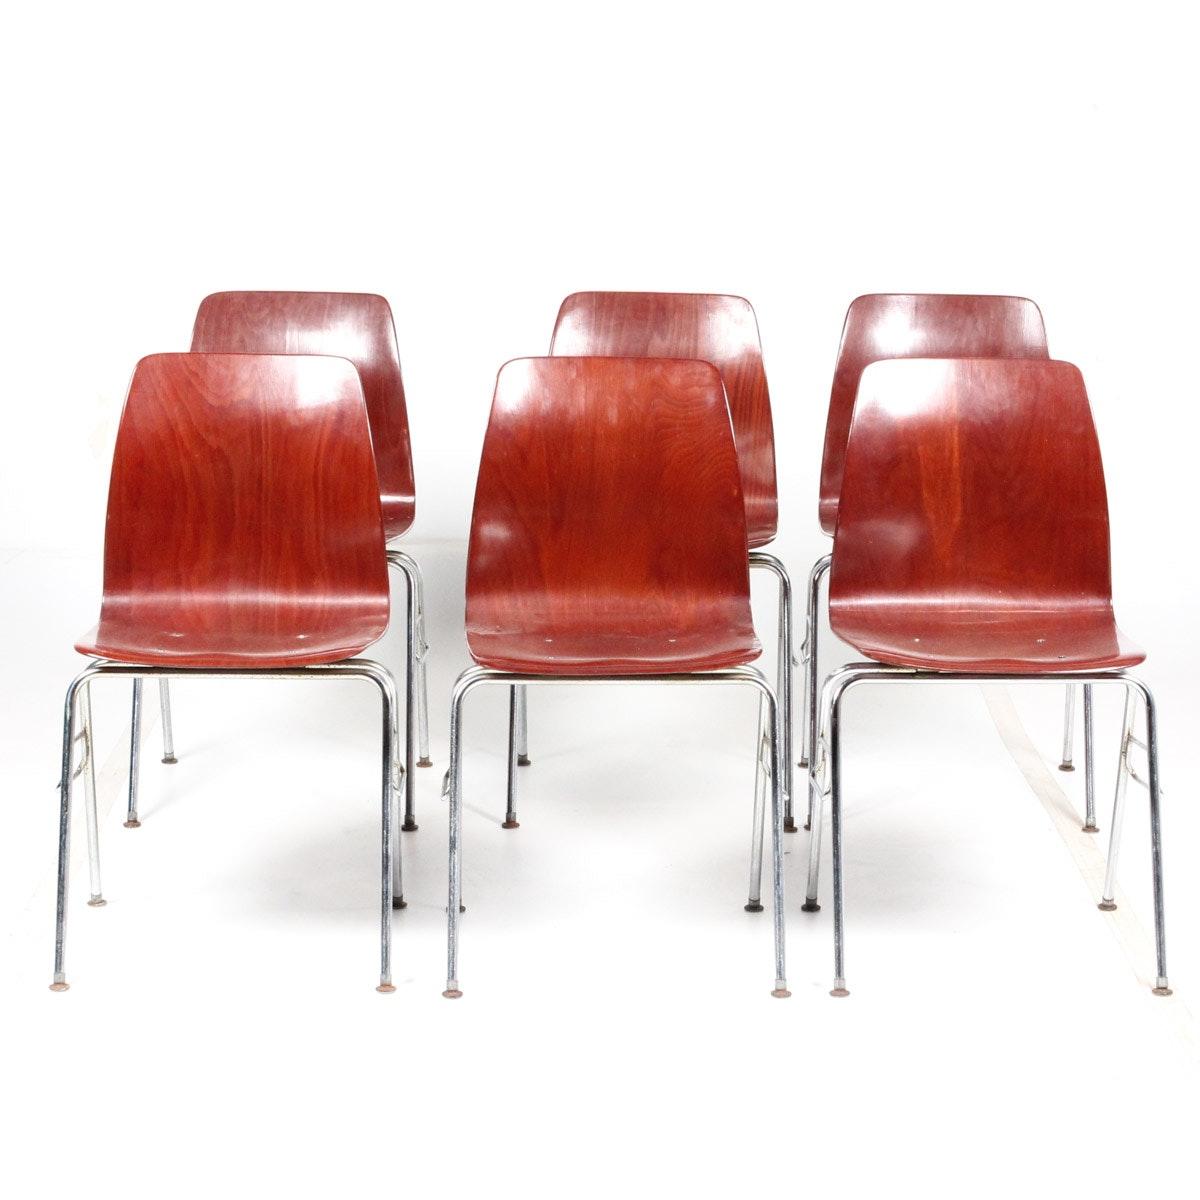 Vintage Royal Desk Chairs